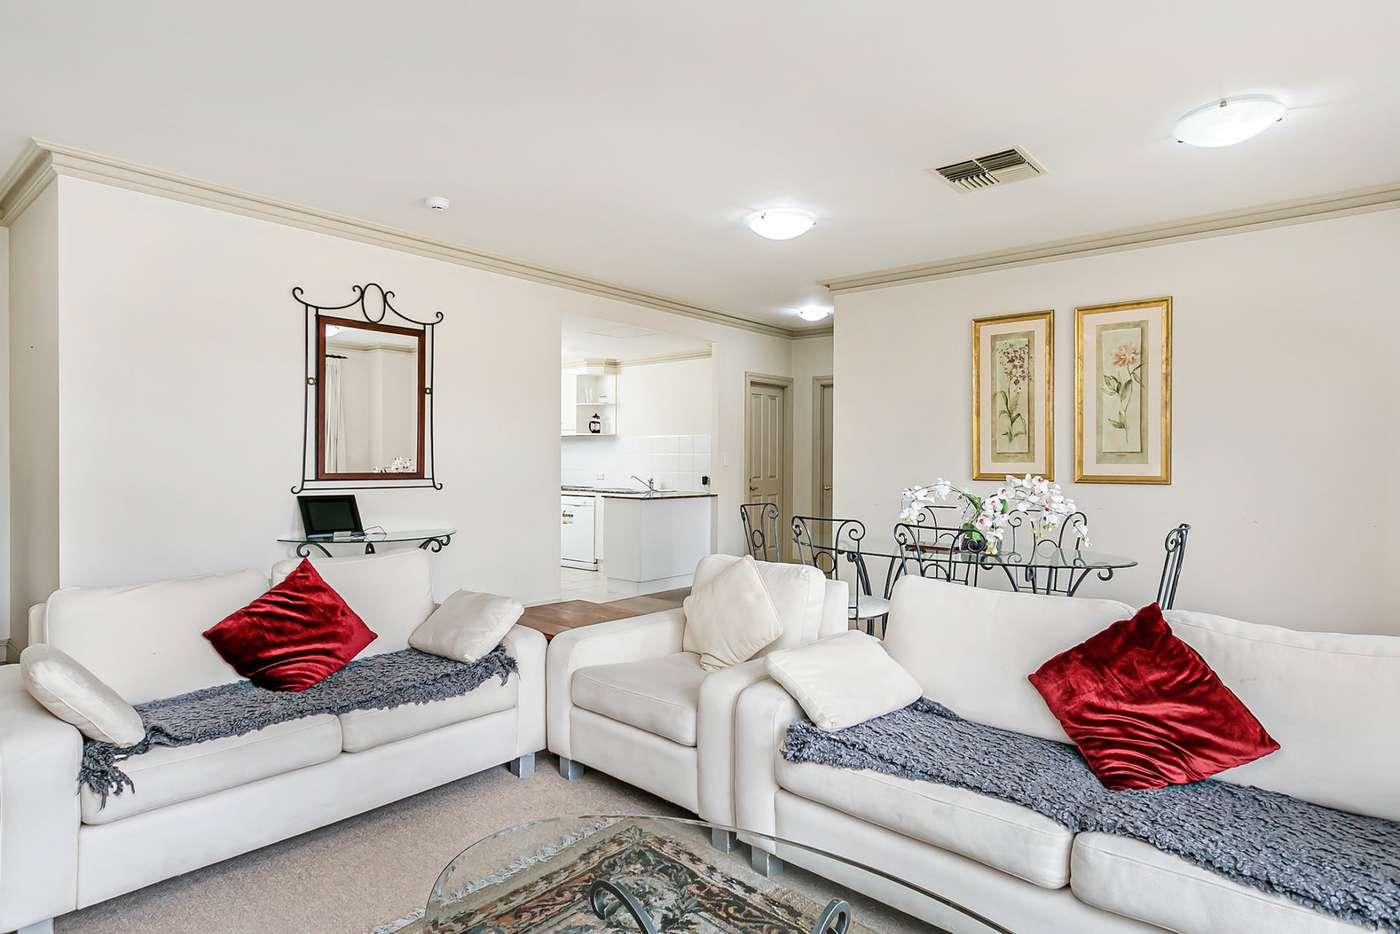 Main view of Homely apartment listing, 25/11 Charlick Circuit, Adelaide SA 5000